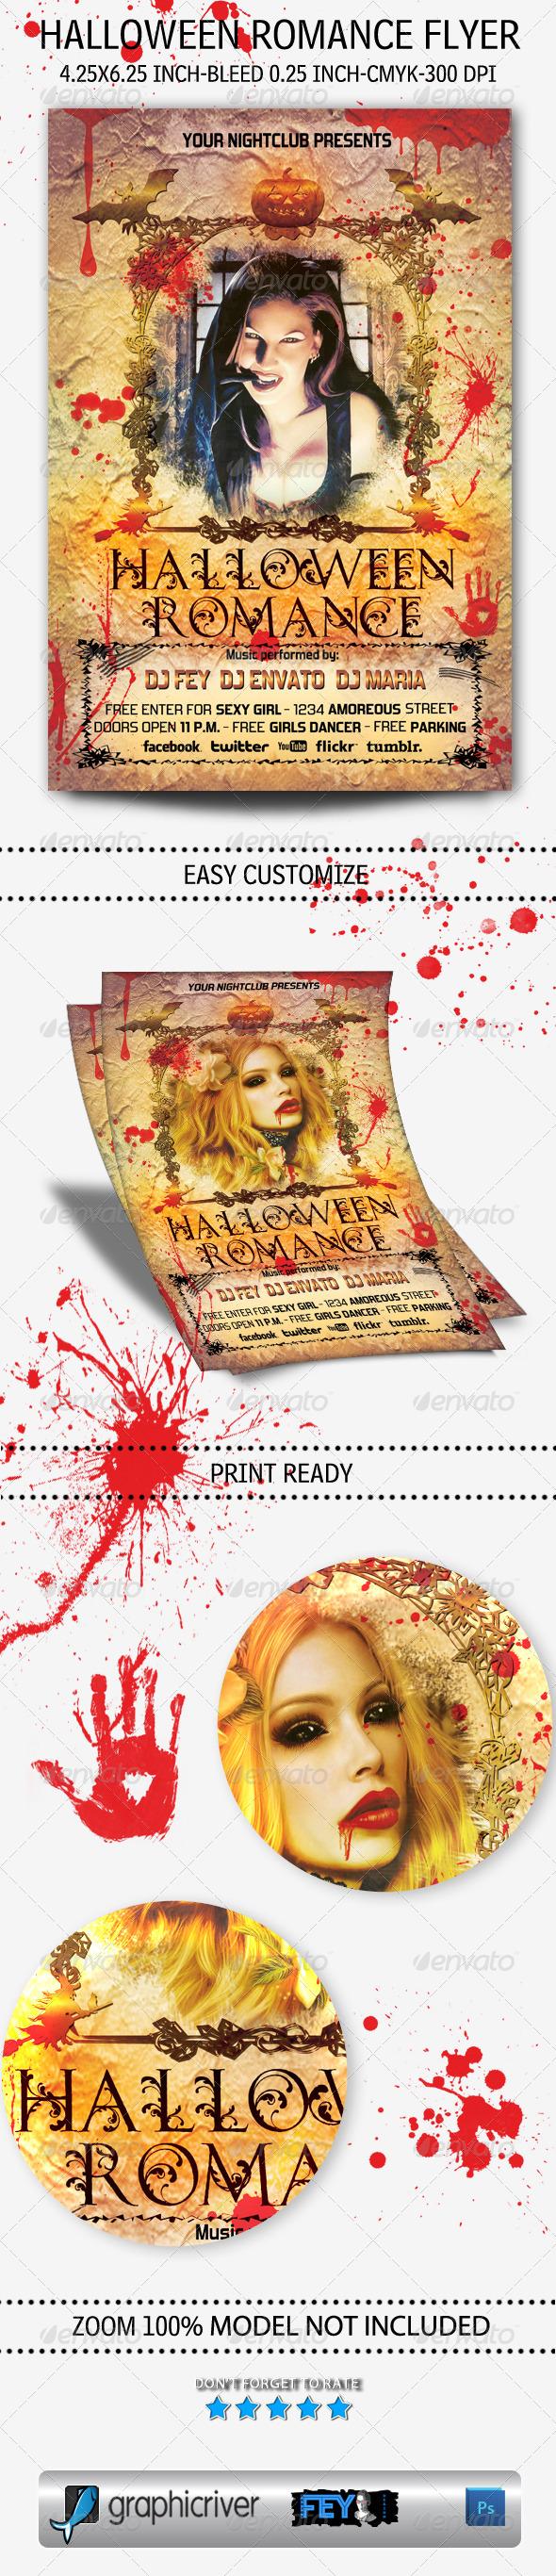 GraphicRiver Halloween Romance Flyer 5450721